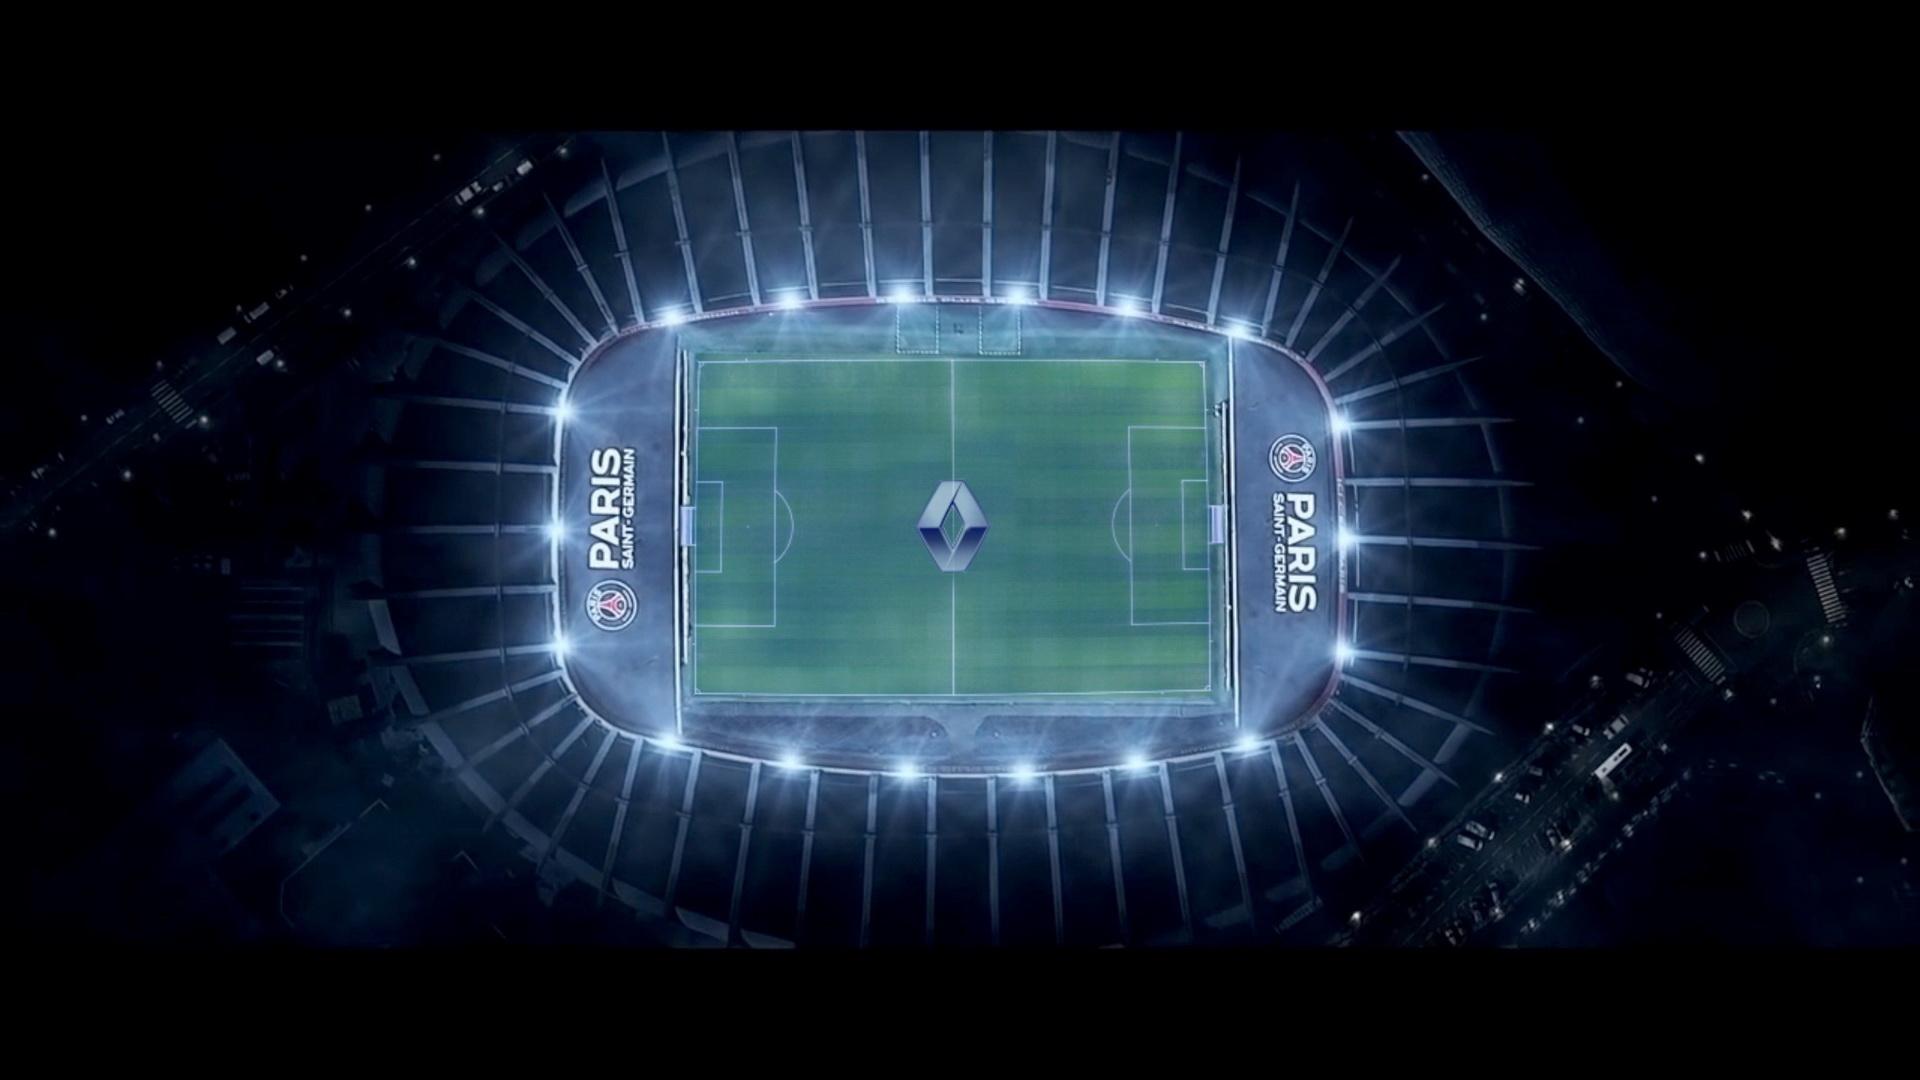 Renault partnerem klubu Paris Saint-Germain